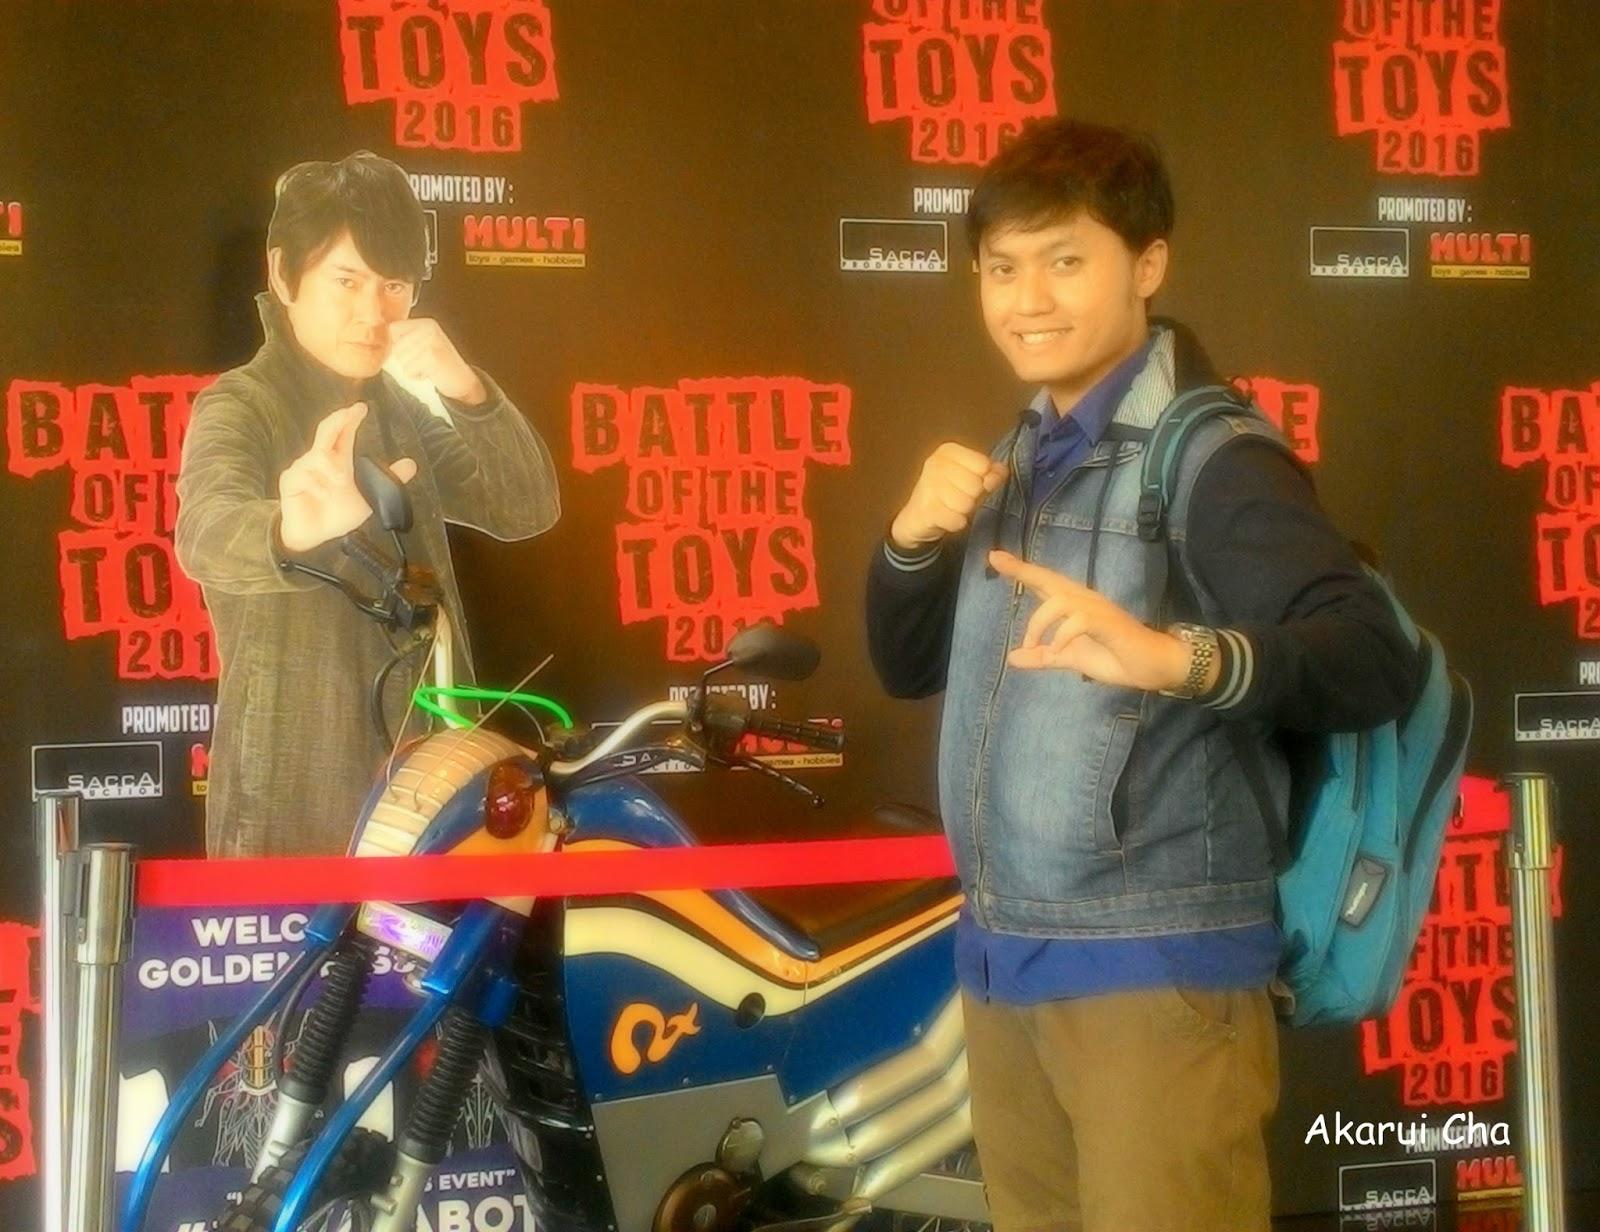 Taman Rahasia Cha: Battle of The Toys 2016 : Say Hello to